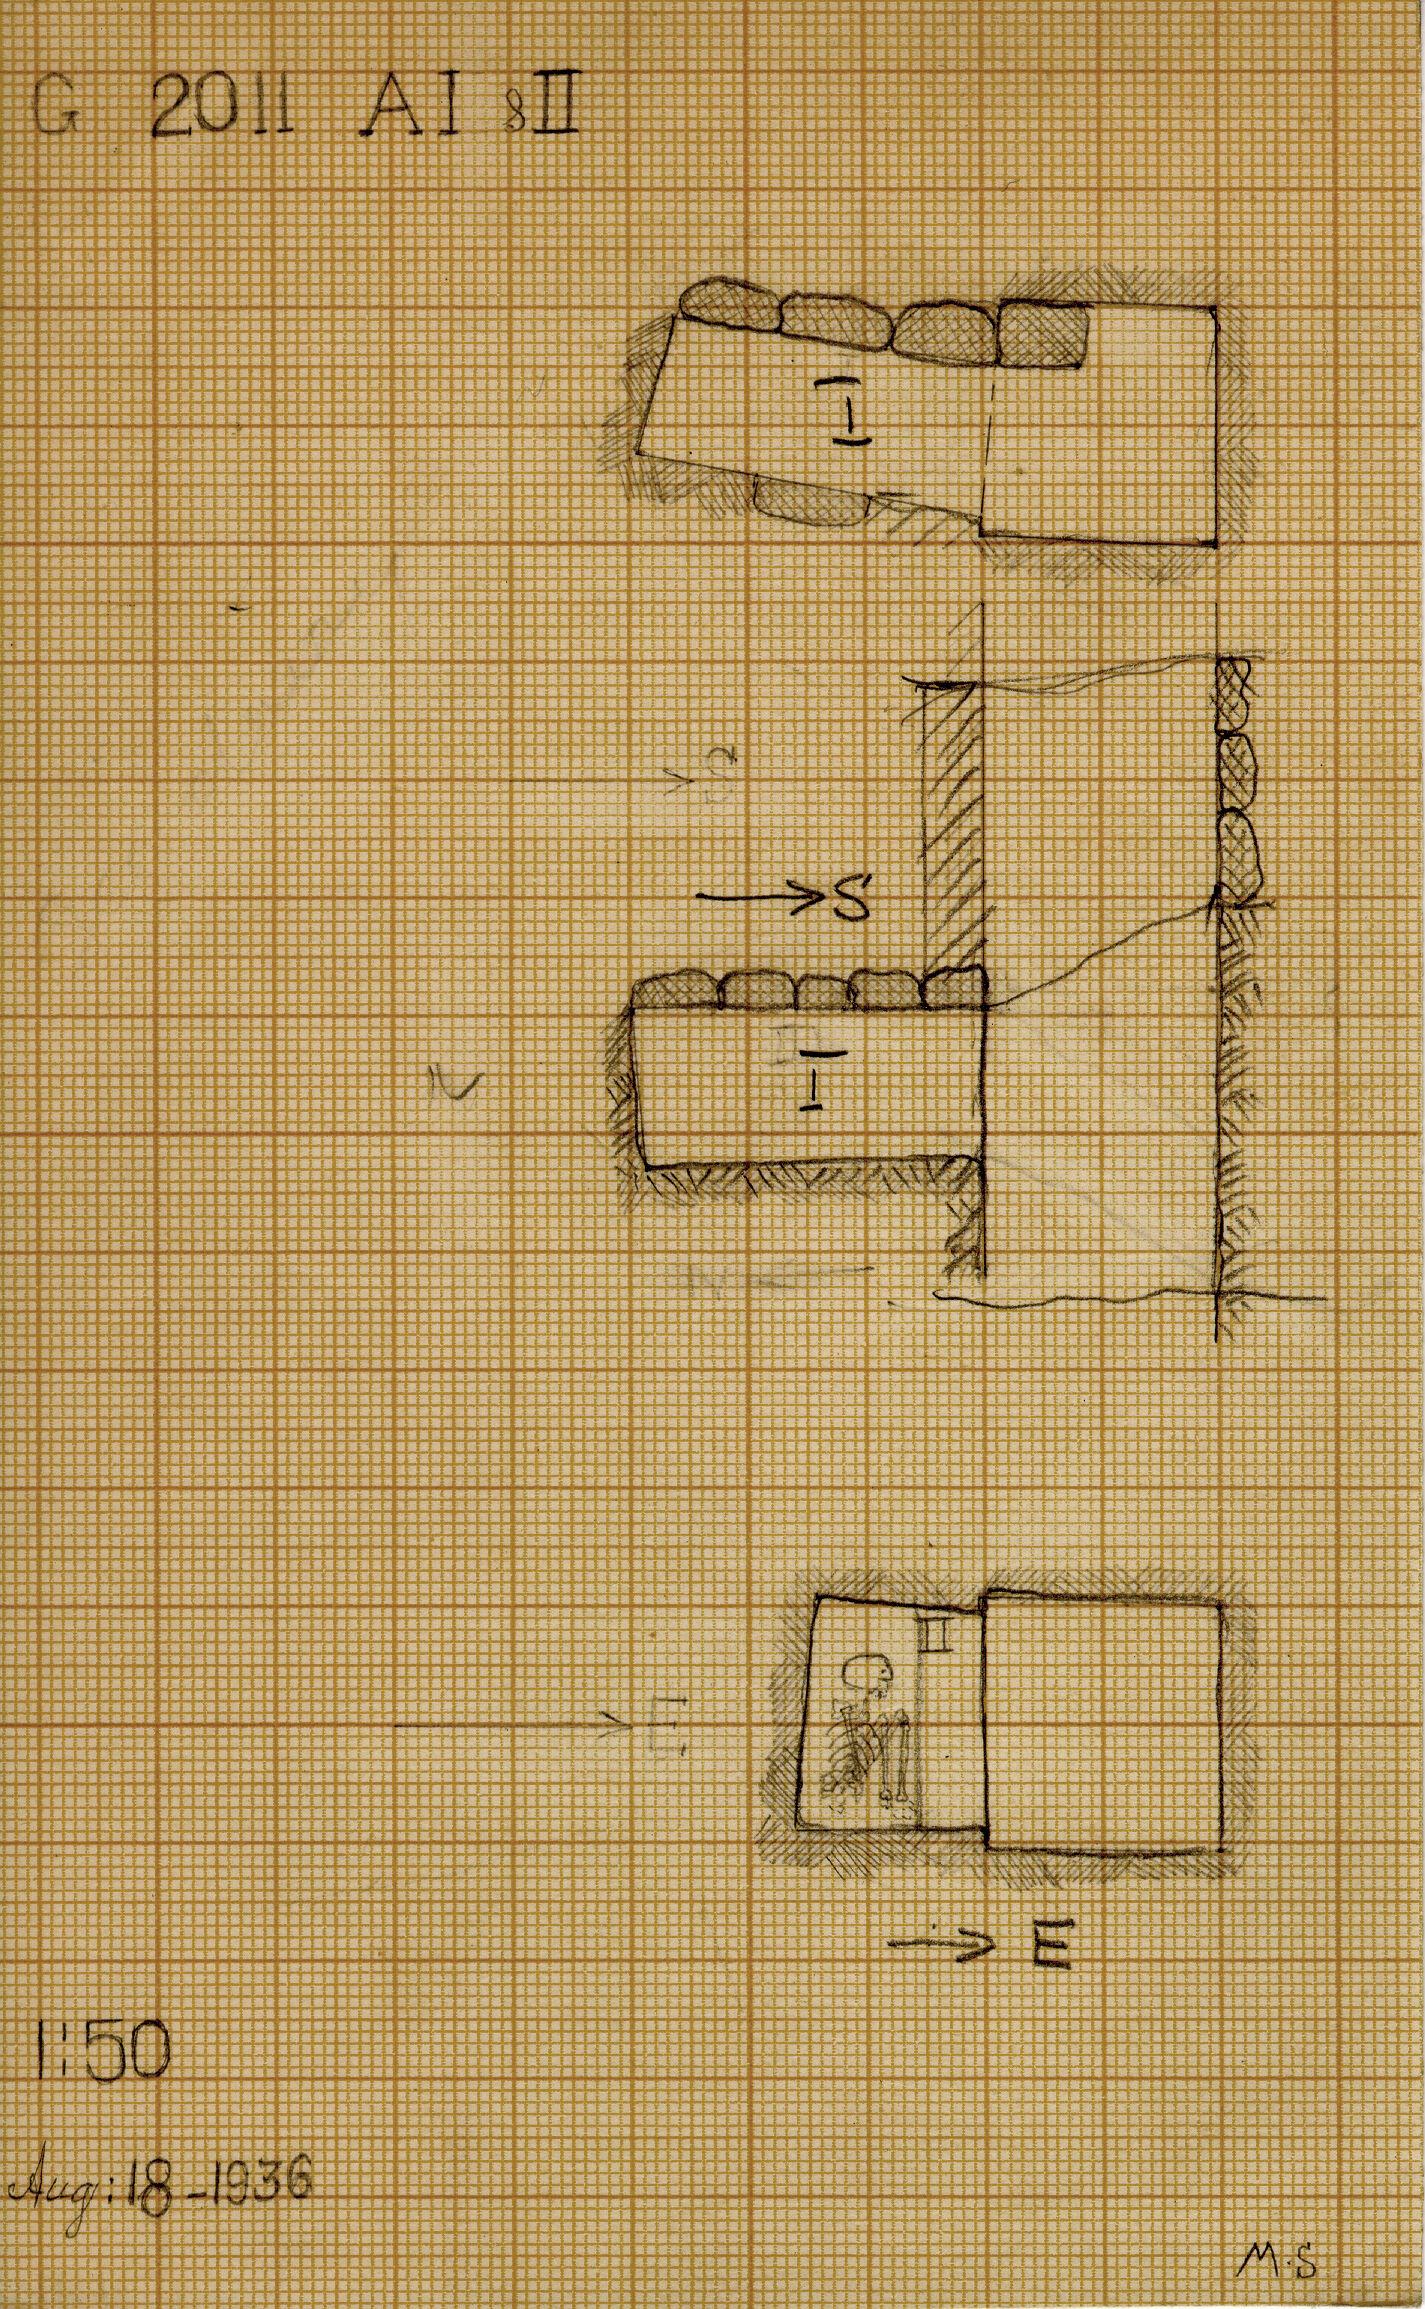 Maps and plans: G 2011, Shaft A (I & II)